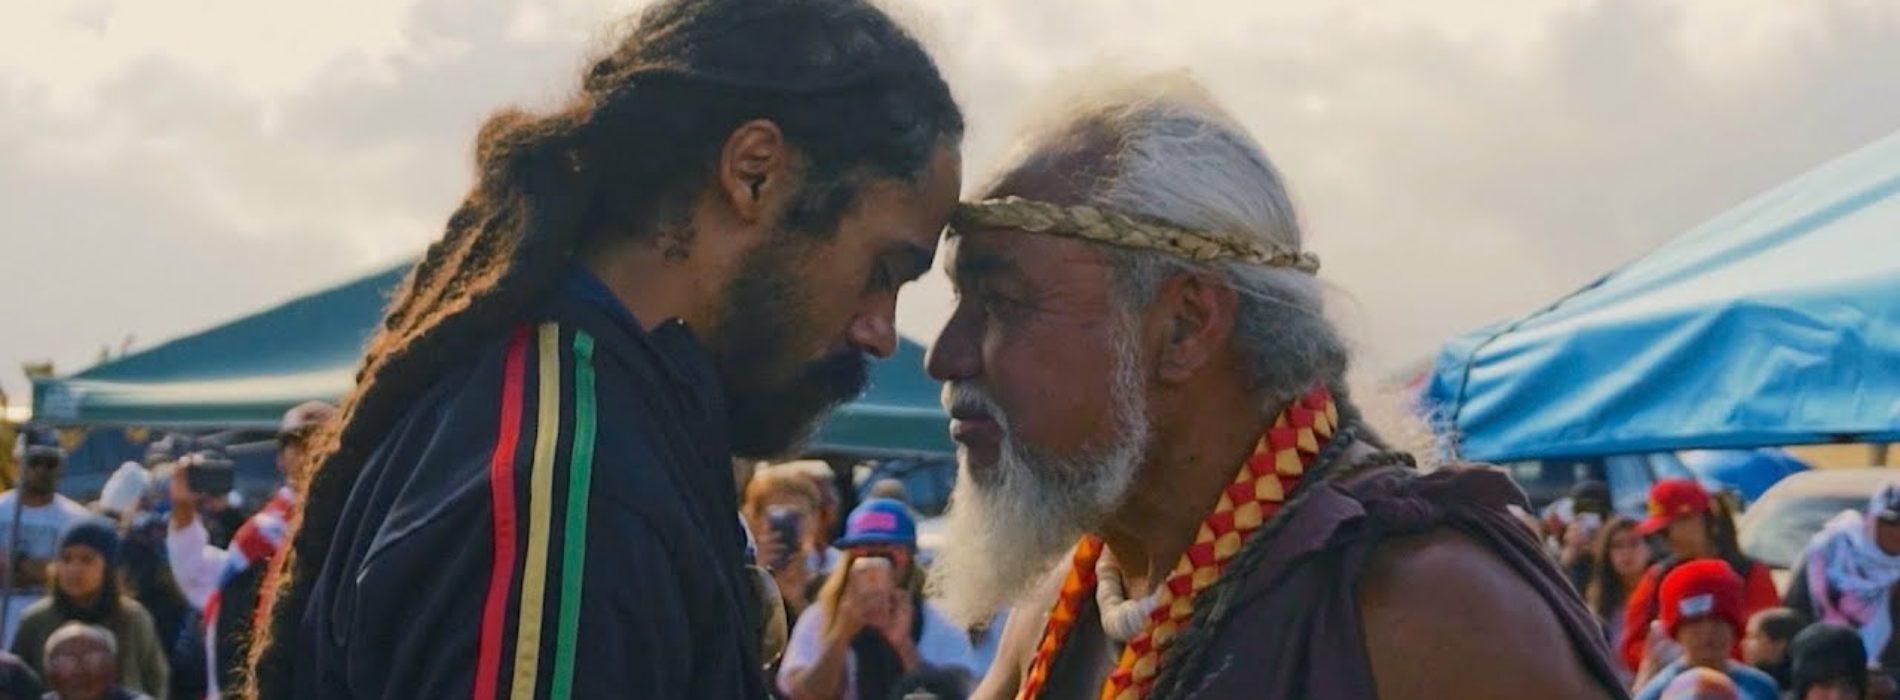 Protect Mauna Kea – Damian «Jr. Gong» Marley – Août 2019